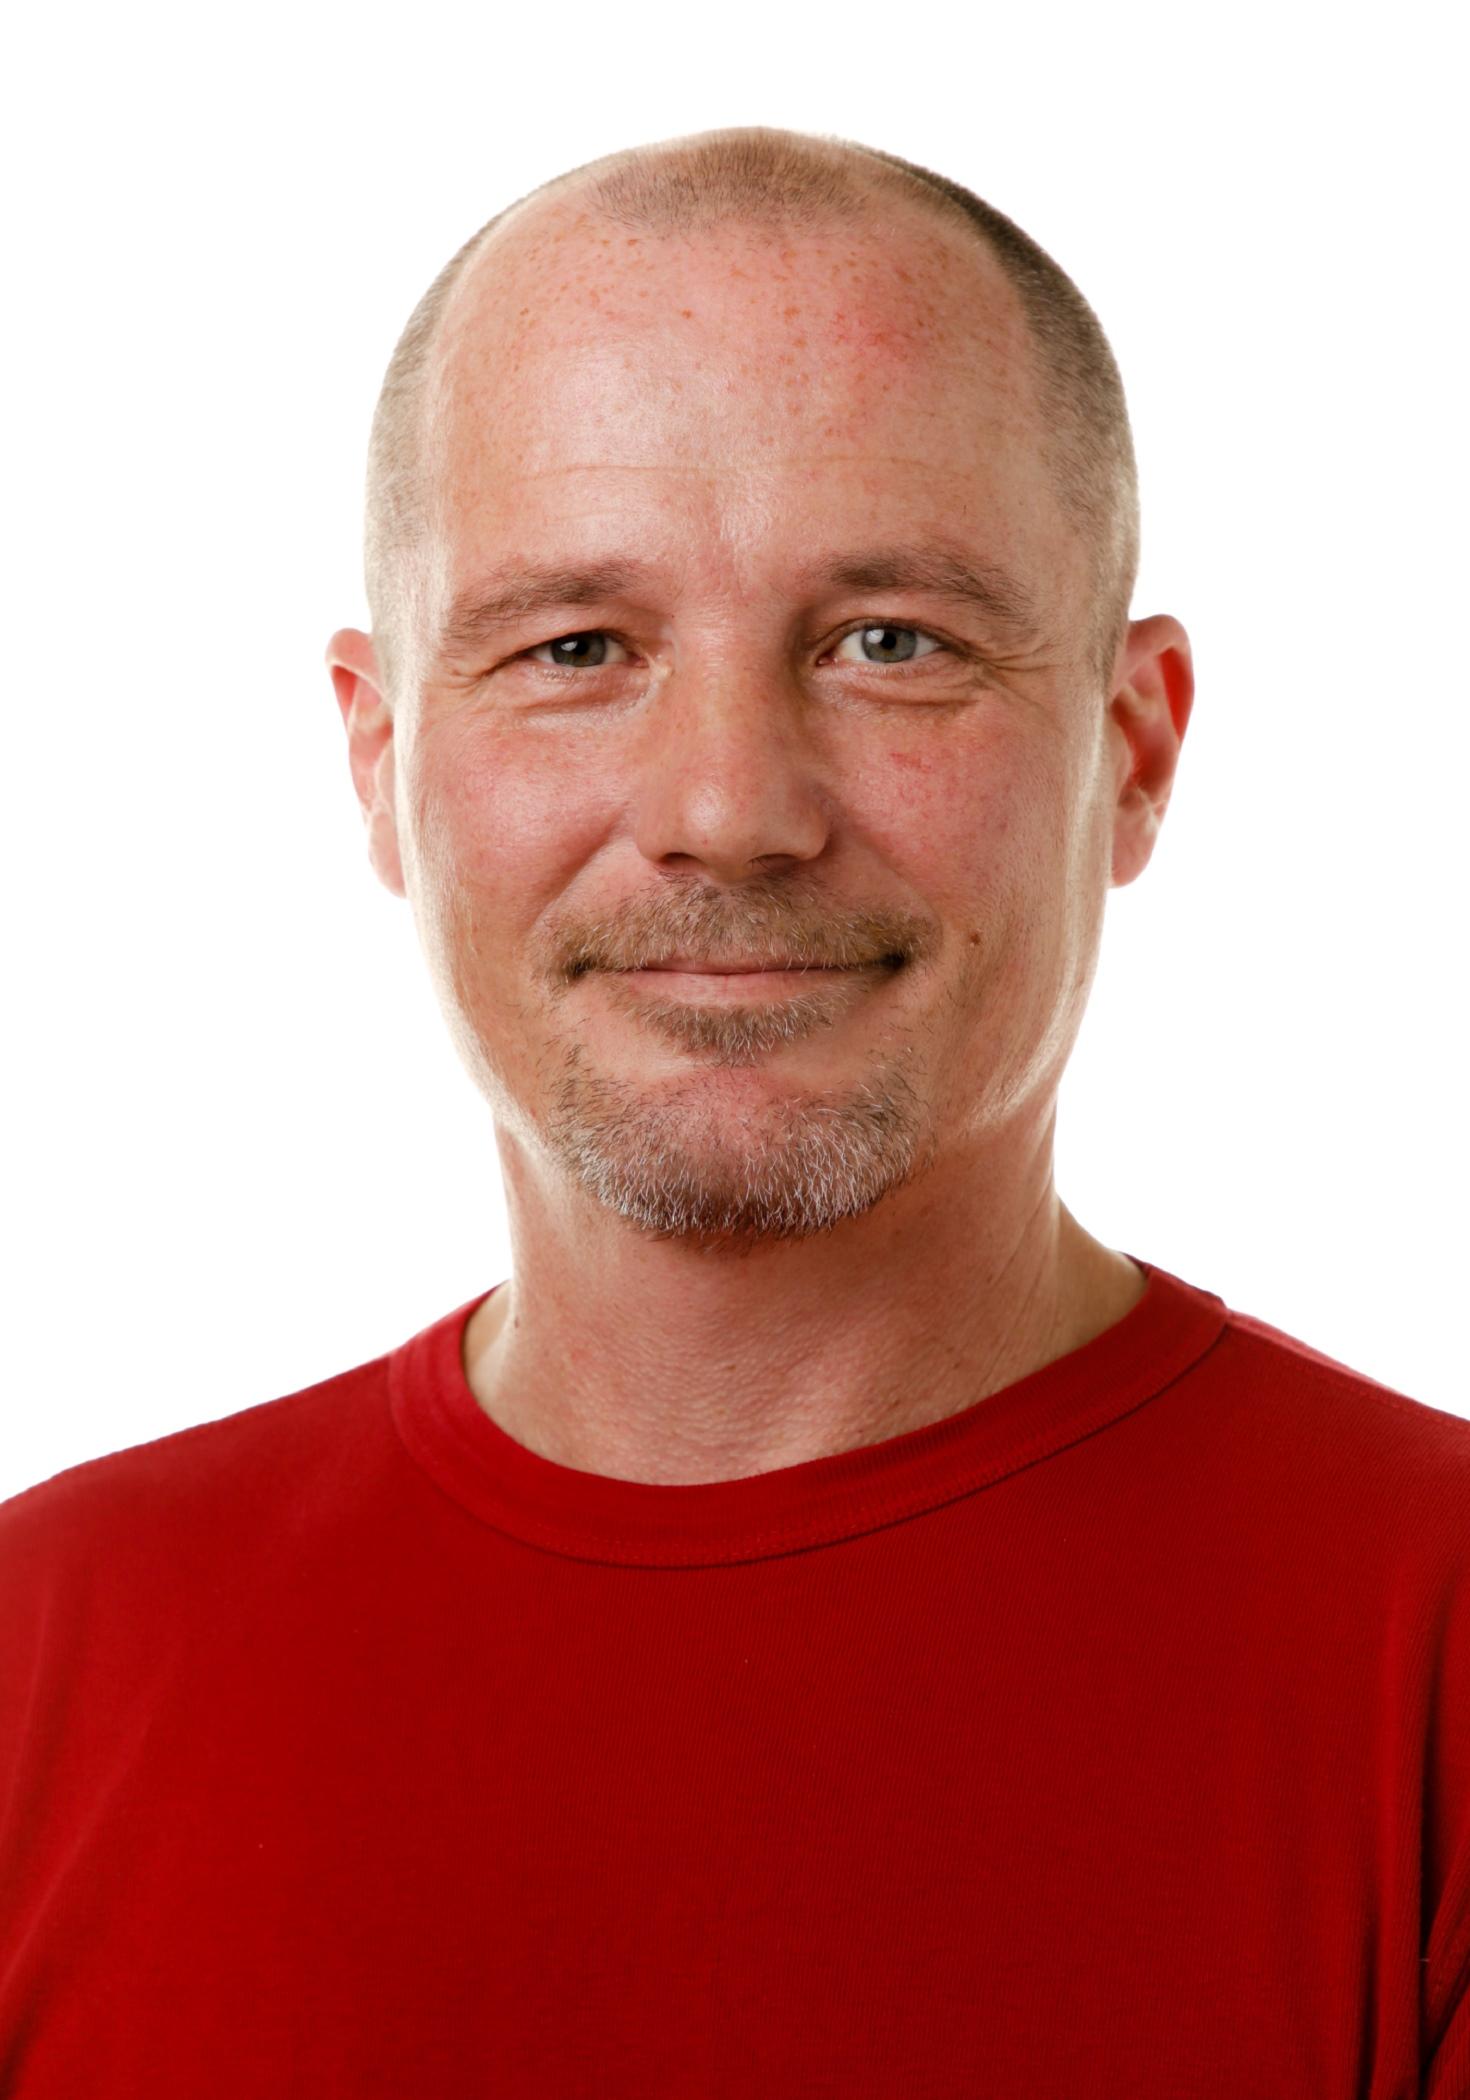 Pædagog, Jan Kotschenreuter